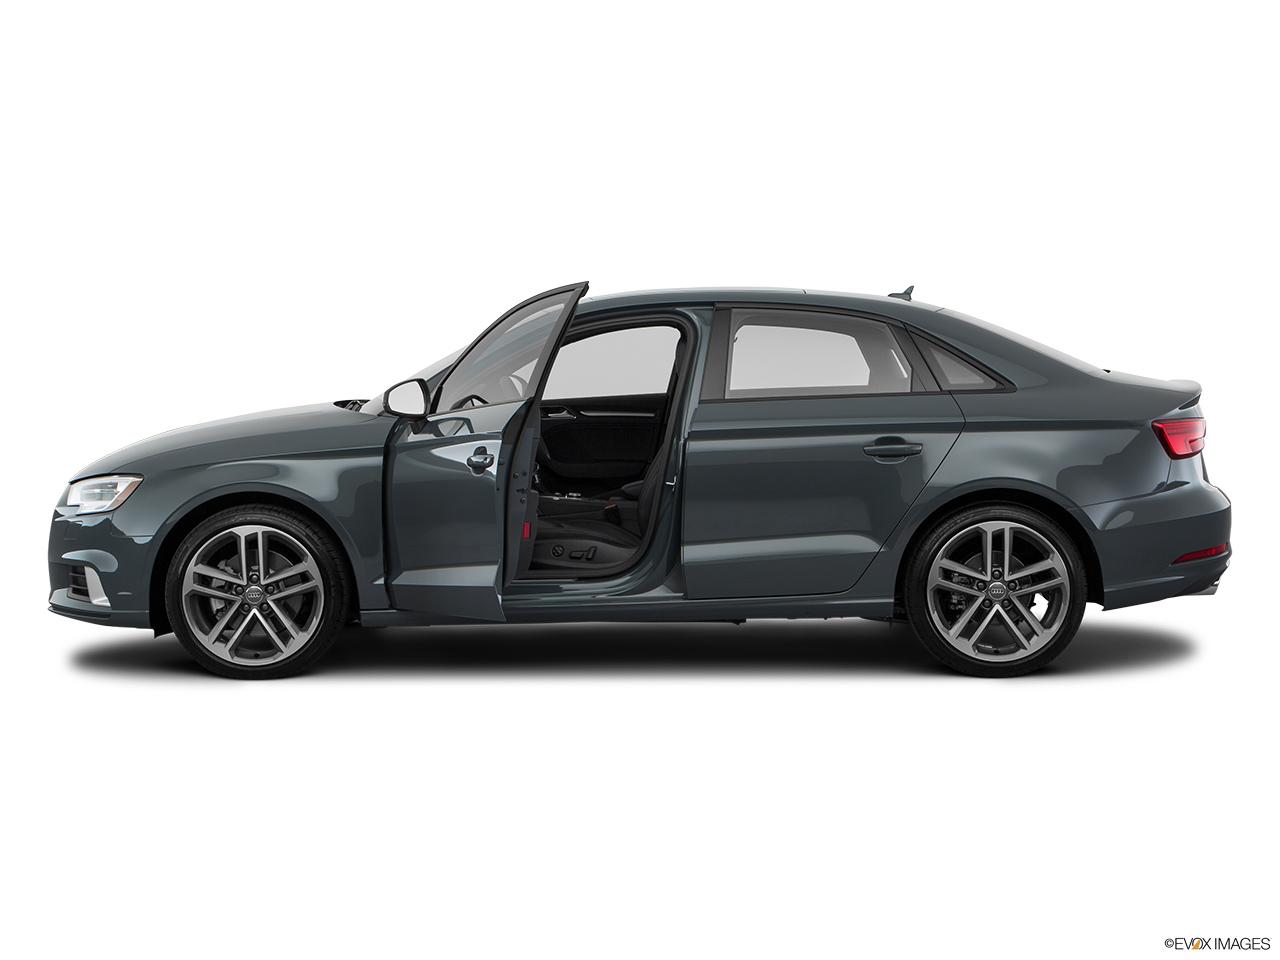 2015 Audi A3 Sedan Rear Side View Photo 35: Audi A3 Sedan 2018 Sport 40 2.0 TFSI 190 HP In UAE: New